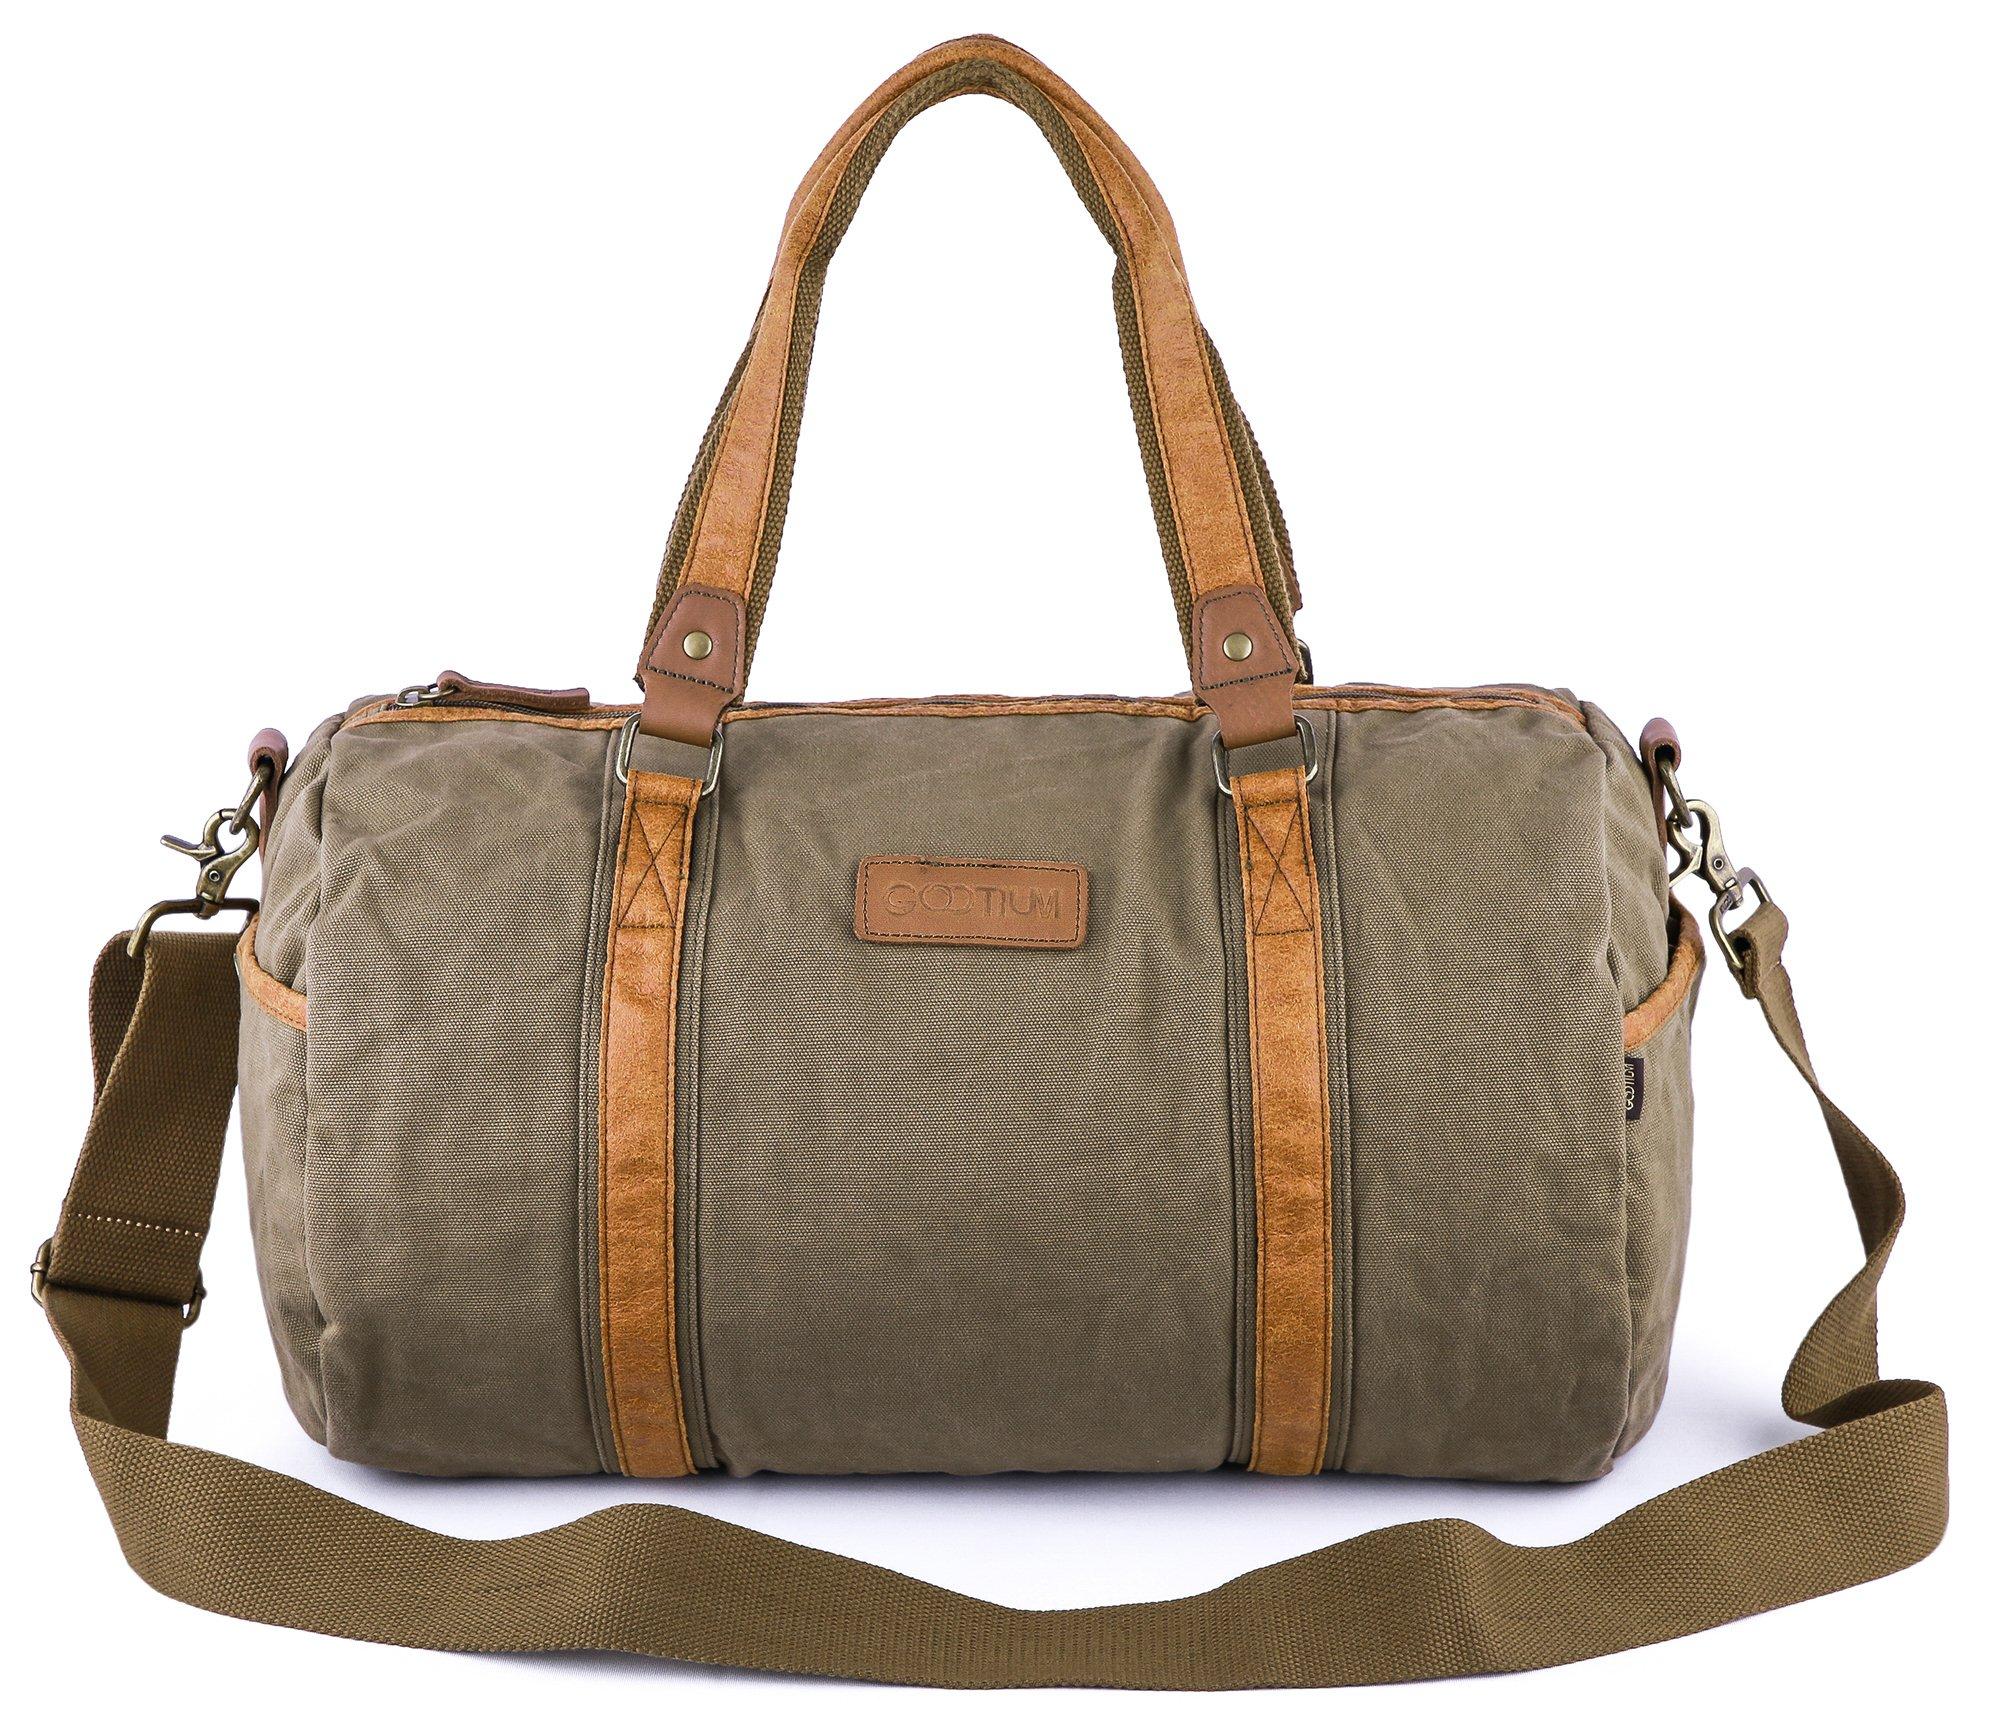 Gootium Canvas Duffel Bag - Travel Duffle Weekender Shoulder Bags Gym Tote, 28L, Army Green